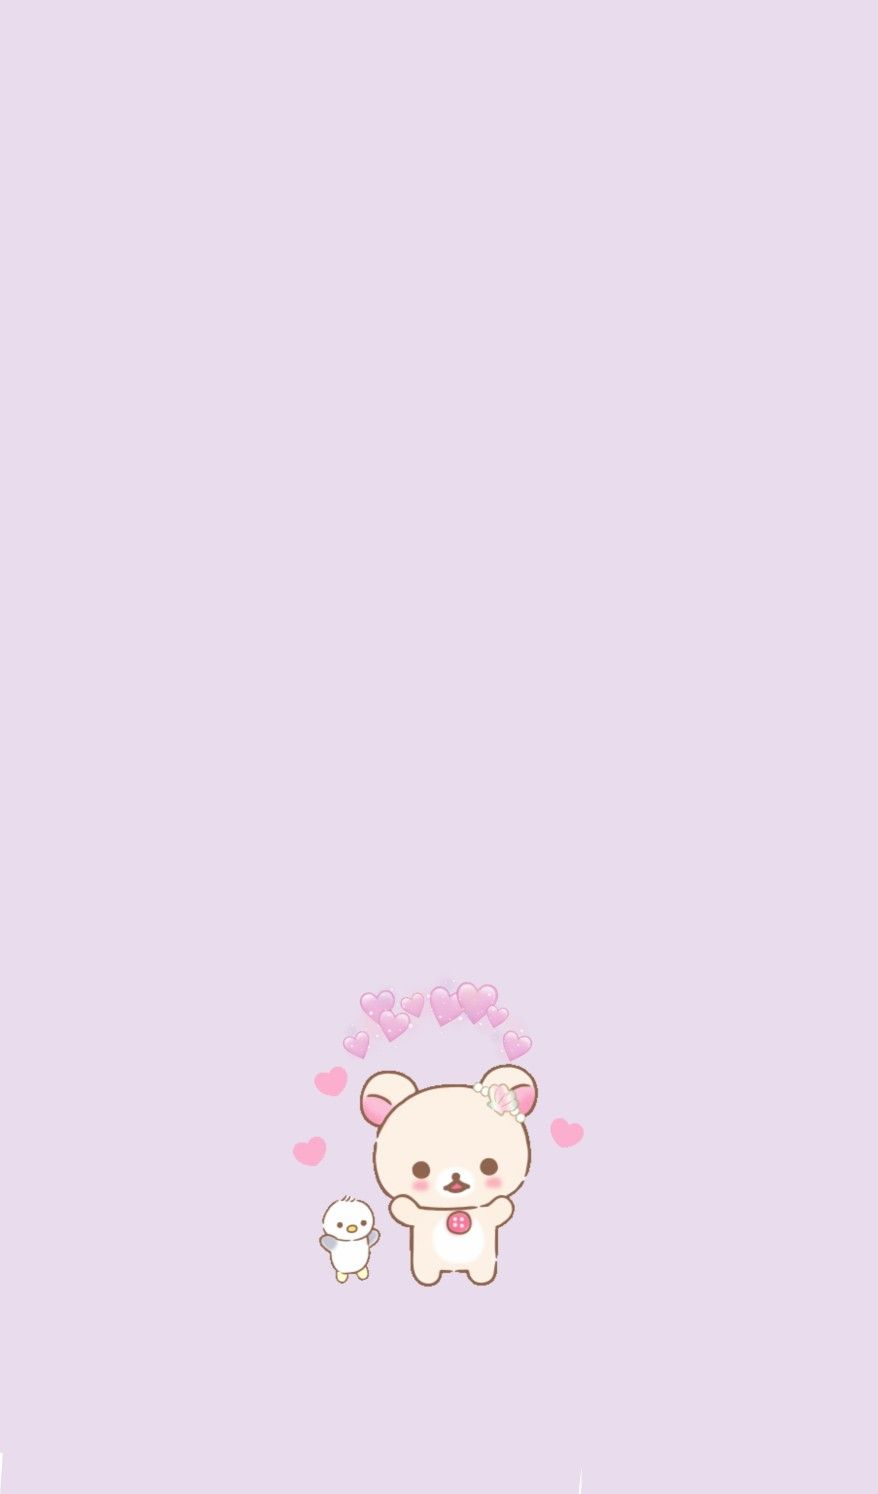 Korilakkuma Cute Pastel Wallpaper Pink Wallpaper Anime Rilakuma Wallpapers